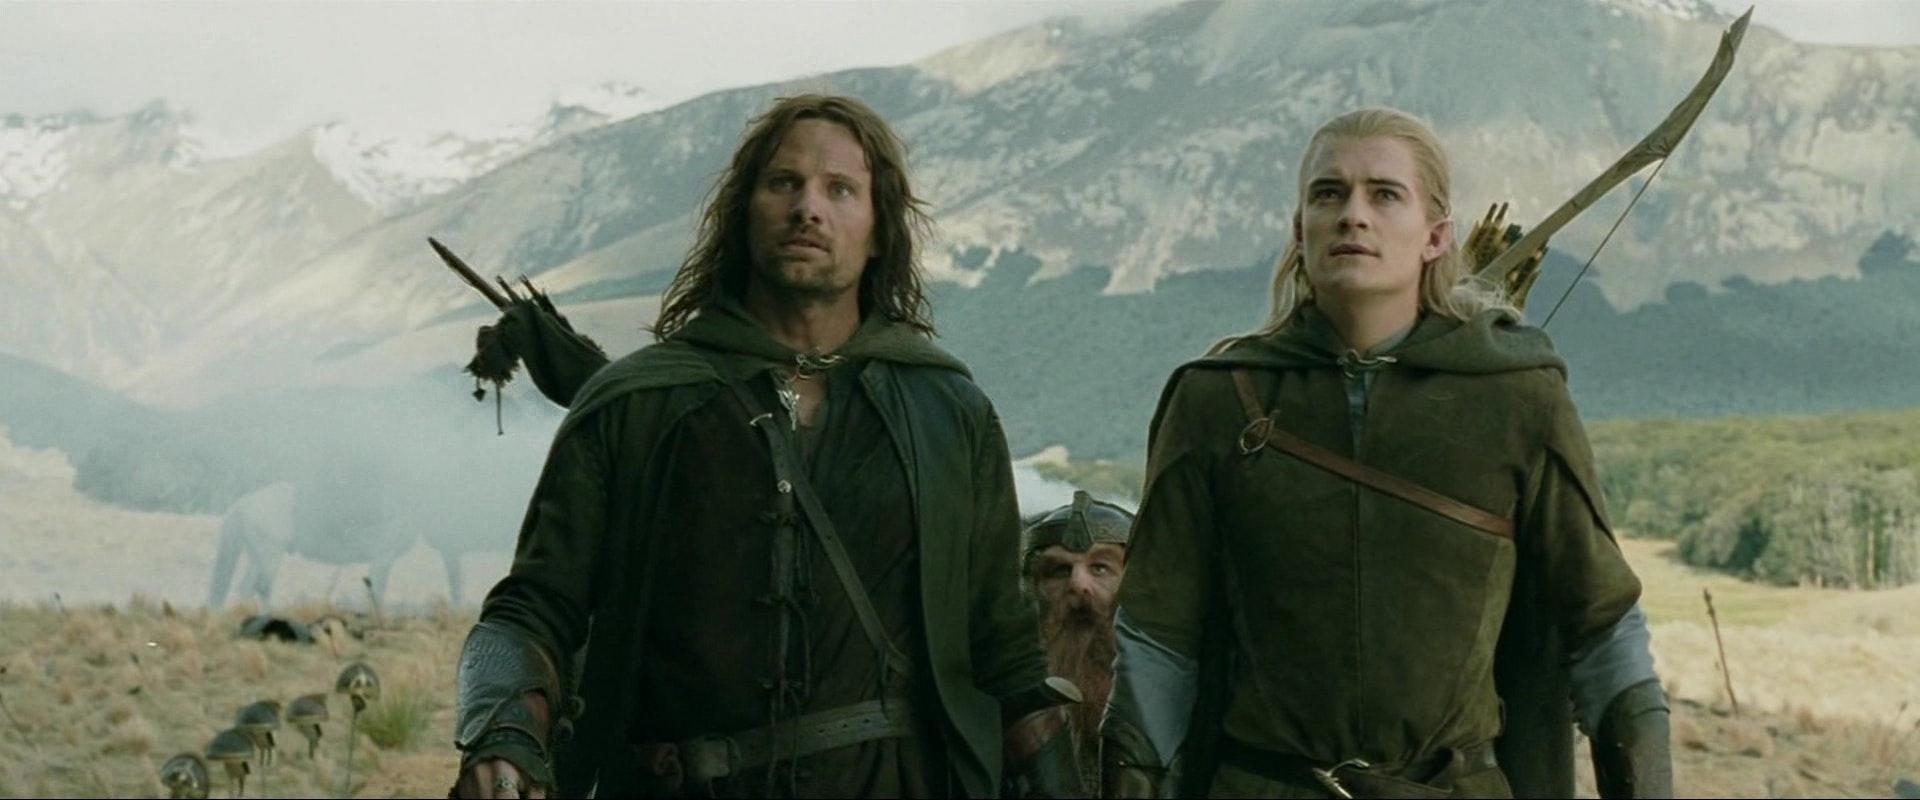 Clarity, Legolas/Aragorn - YouTube